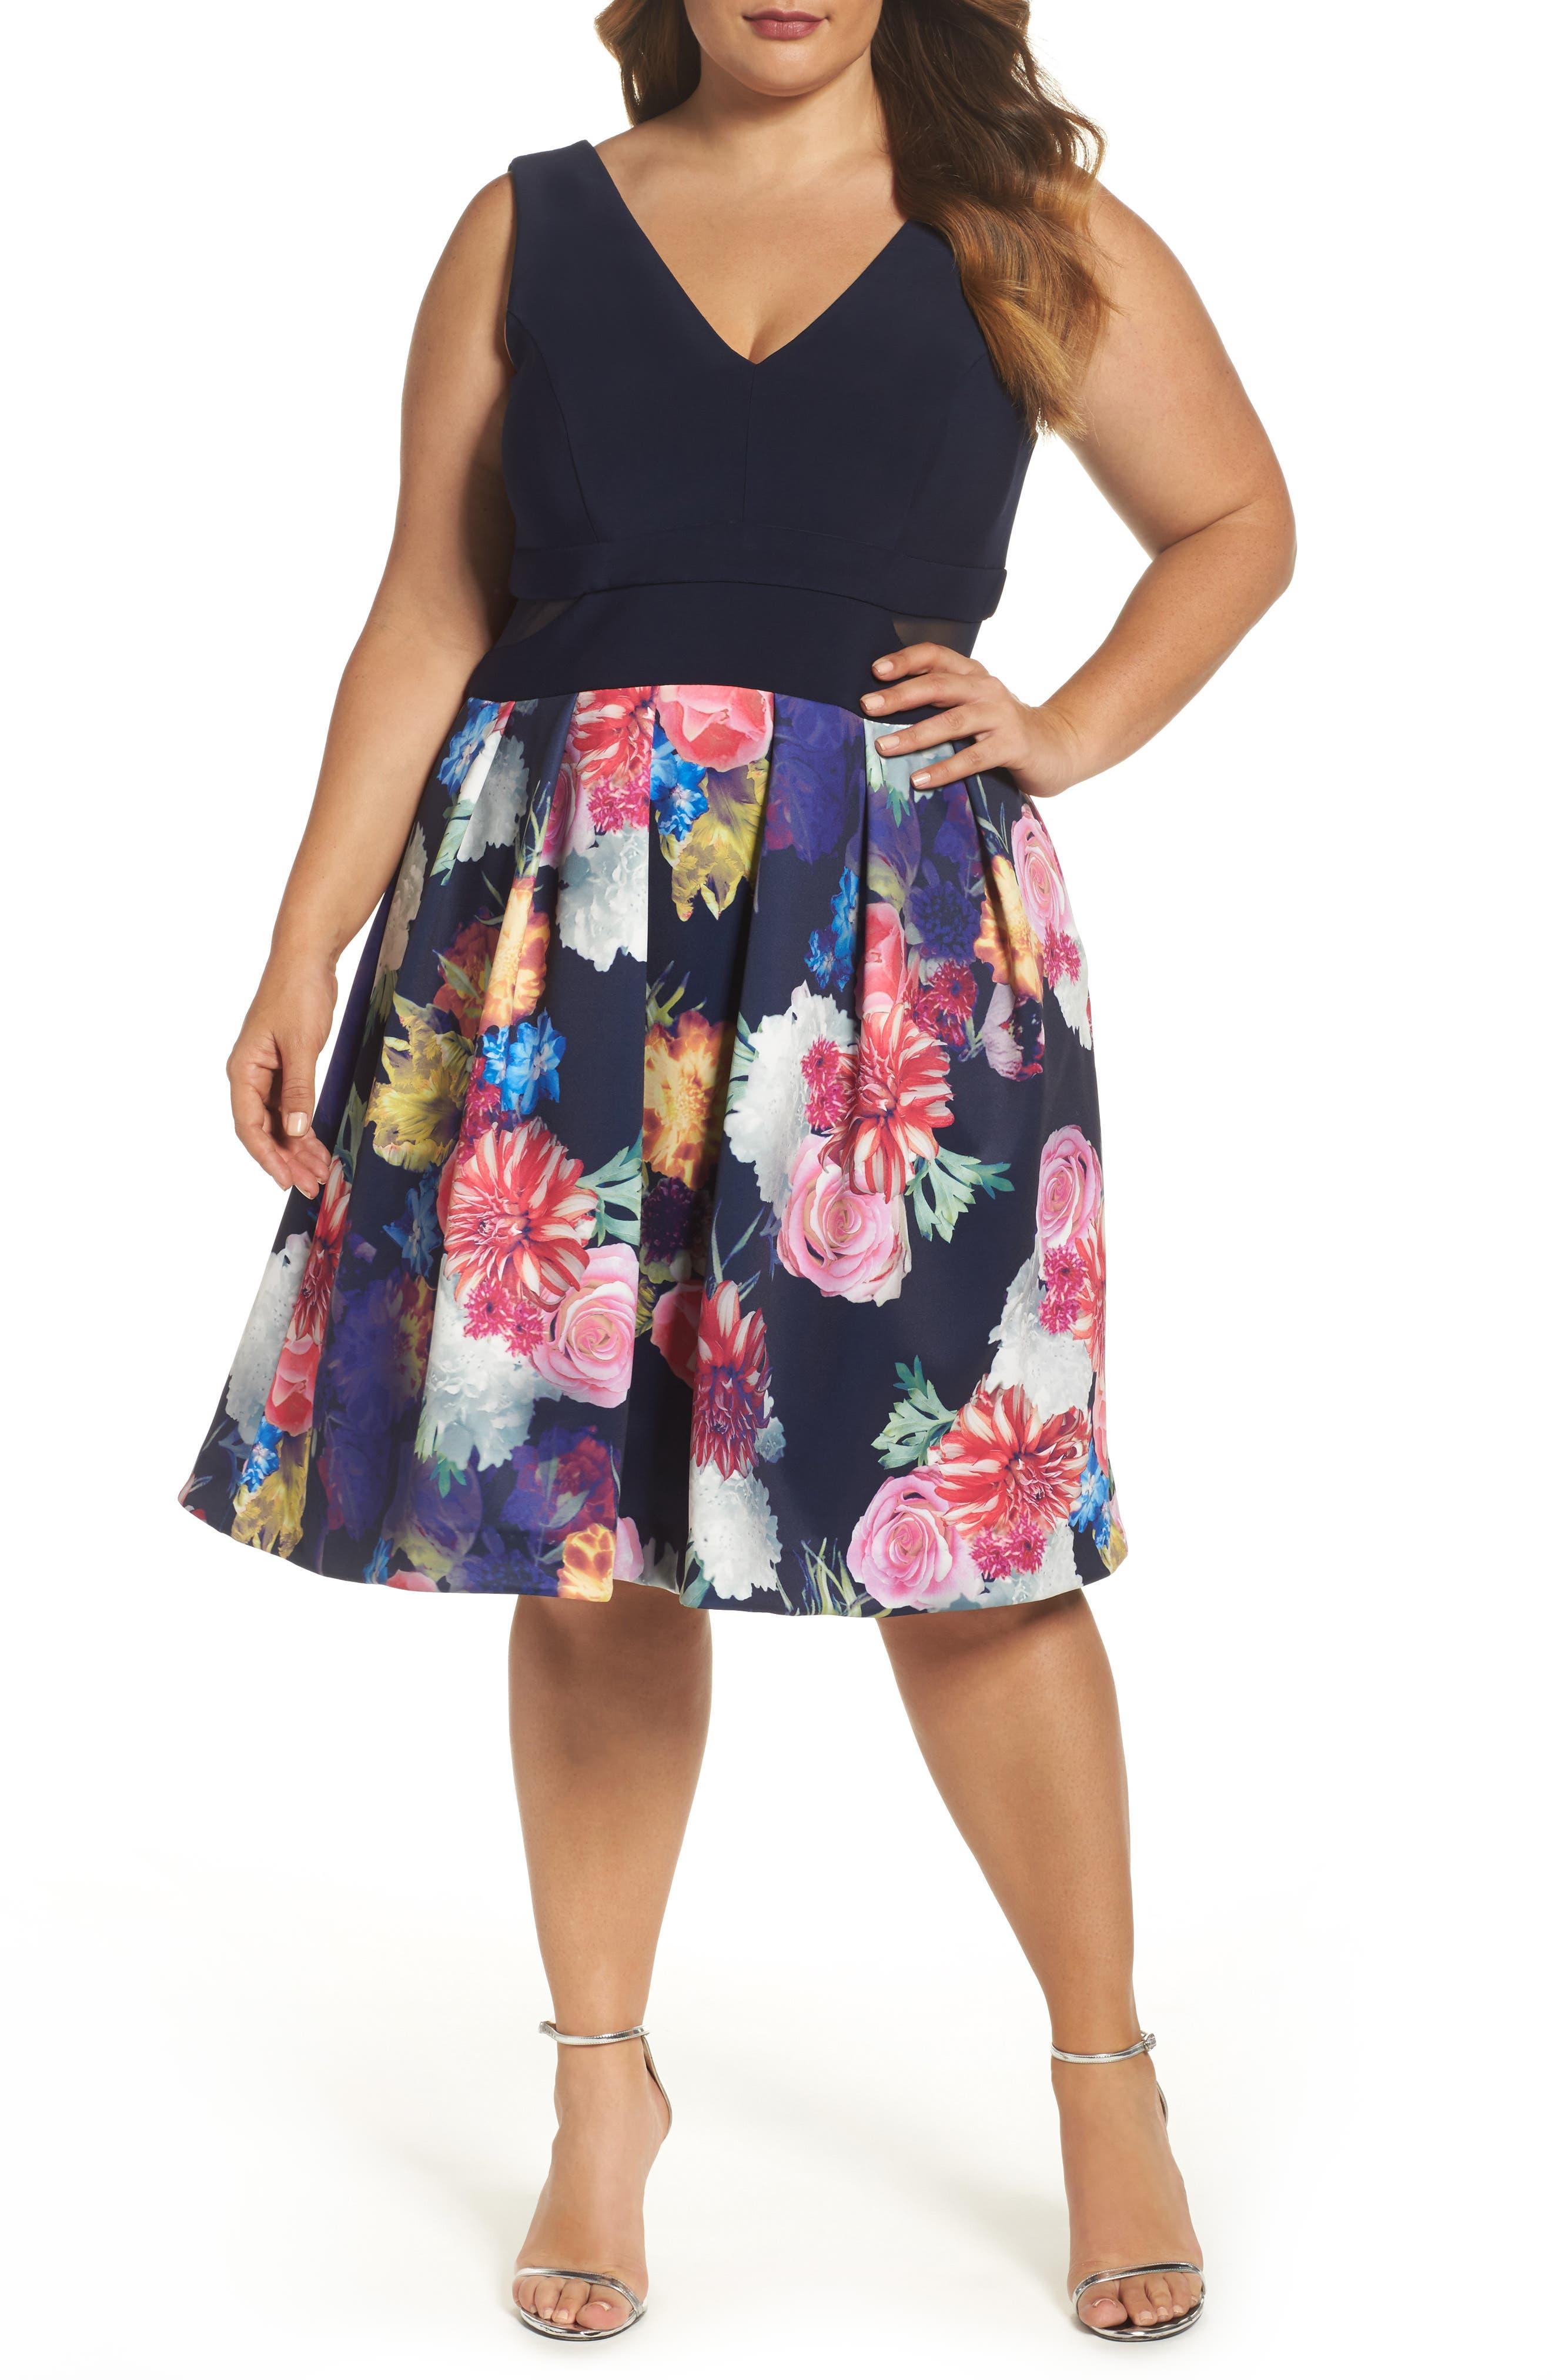 XSCAPE Mesh Inset Print Skirt Scuba Knit Dress